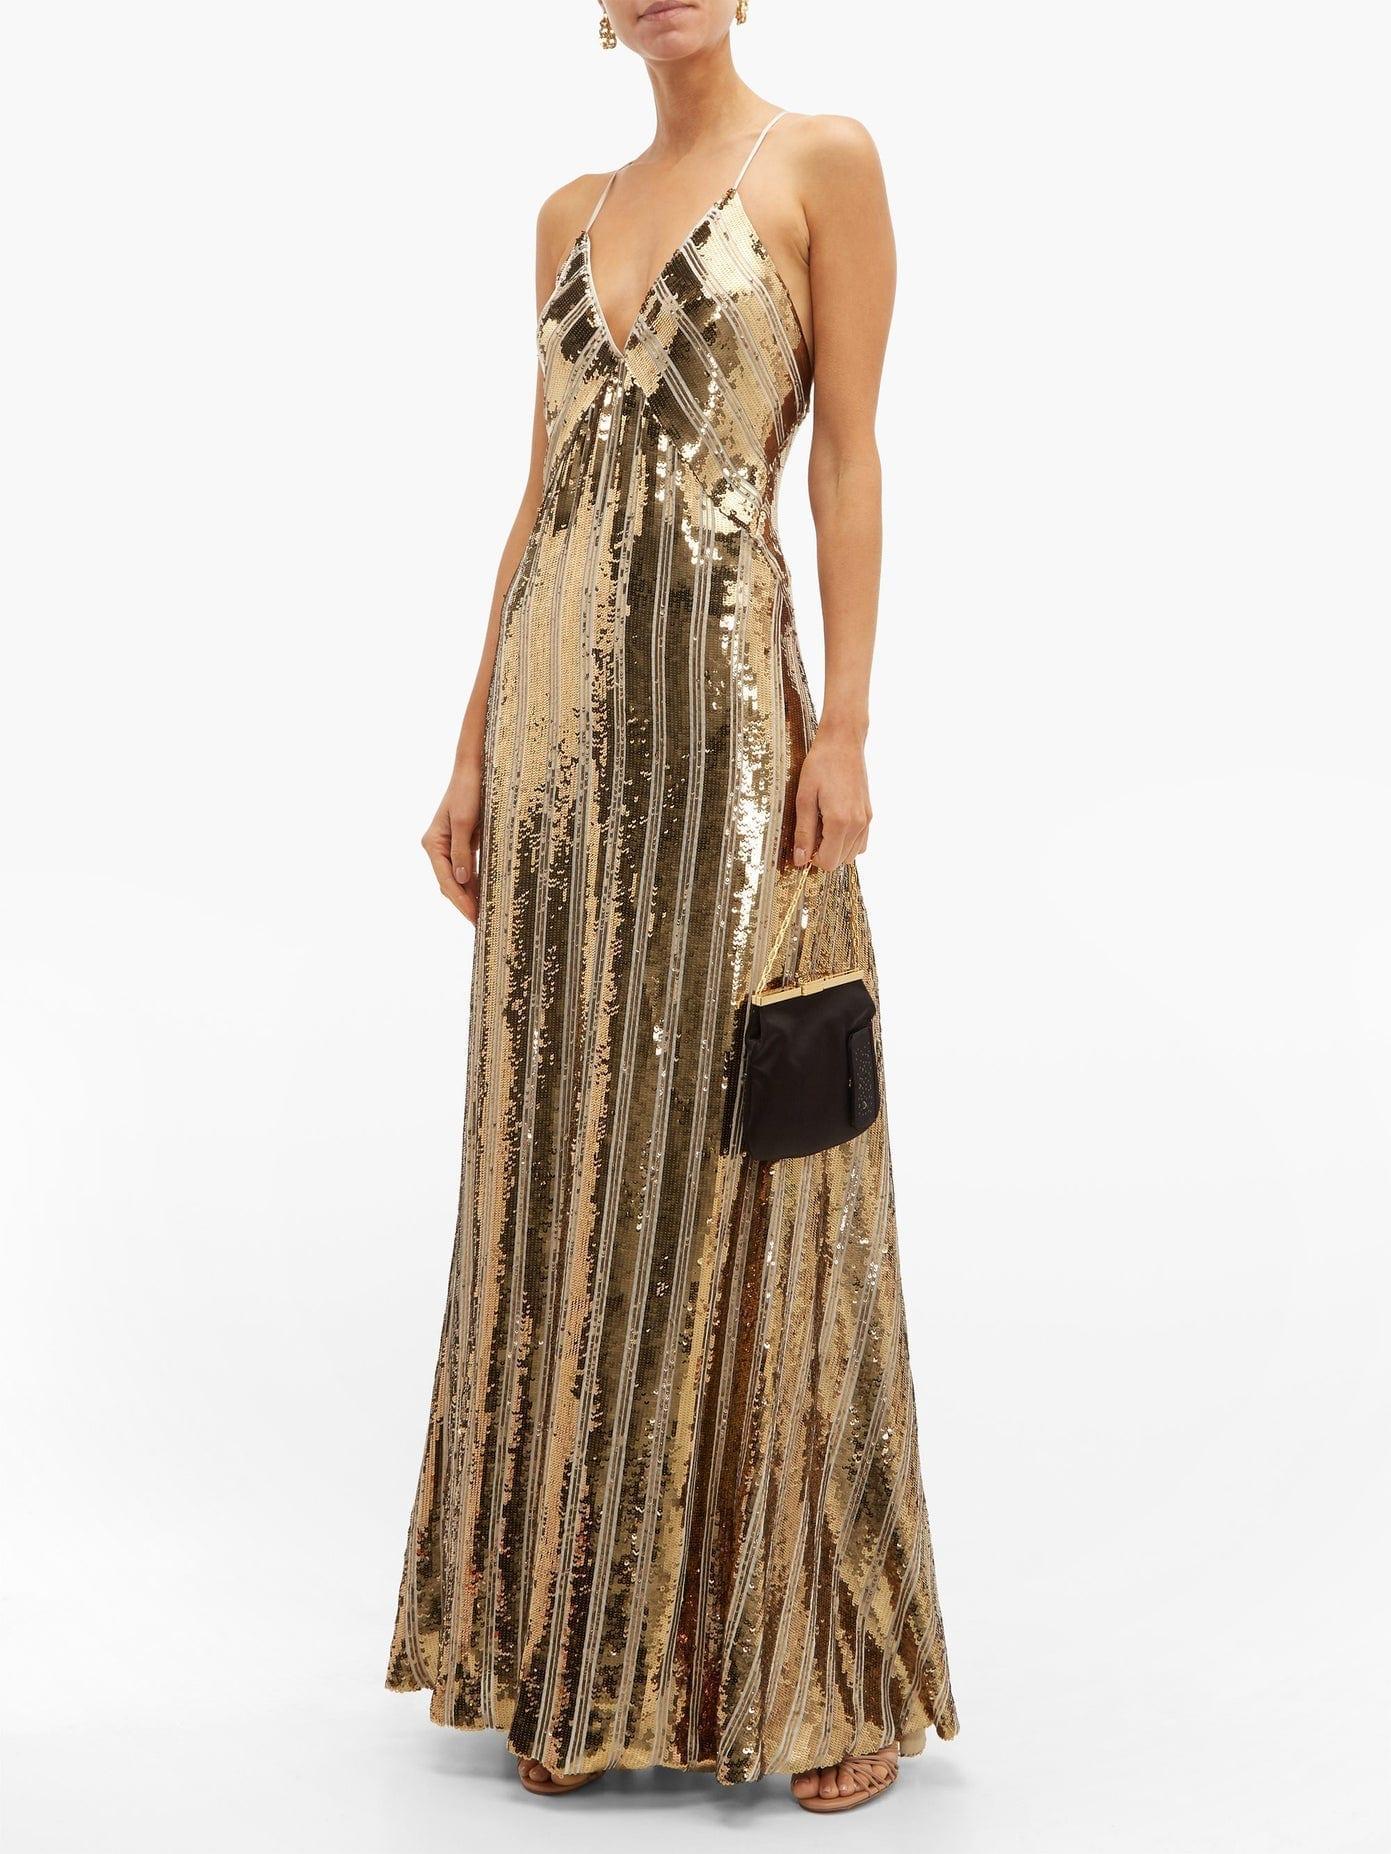 GALVAN Stardust Sequinned Maxi Dress